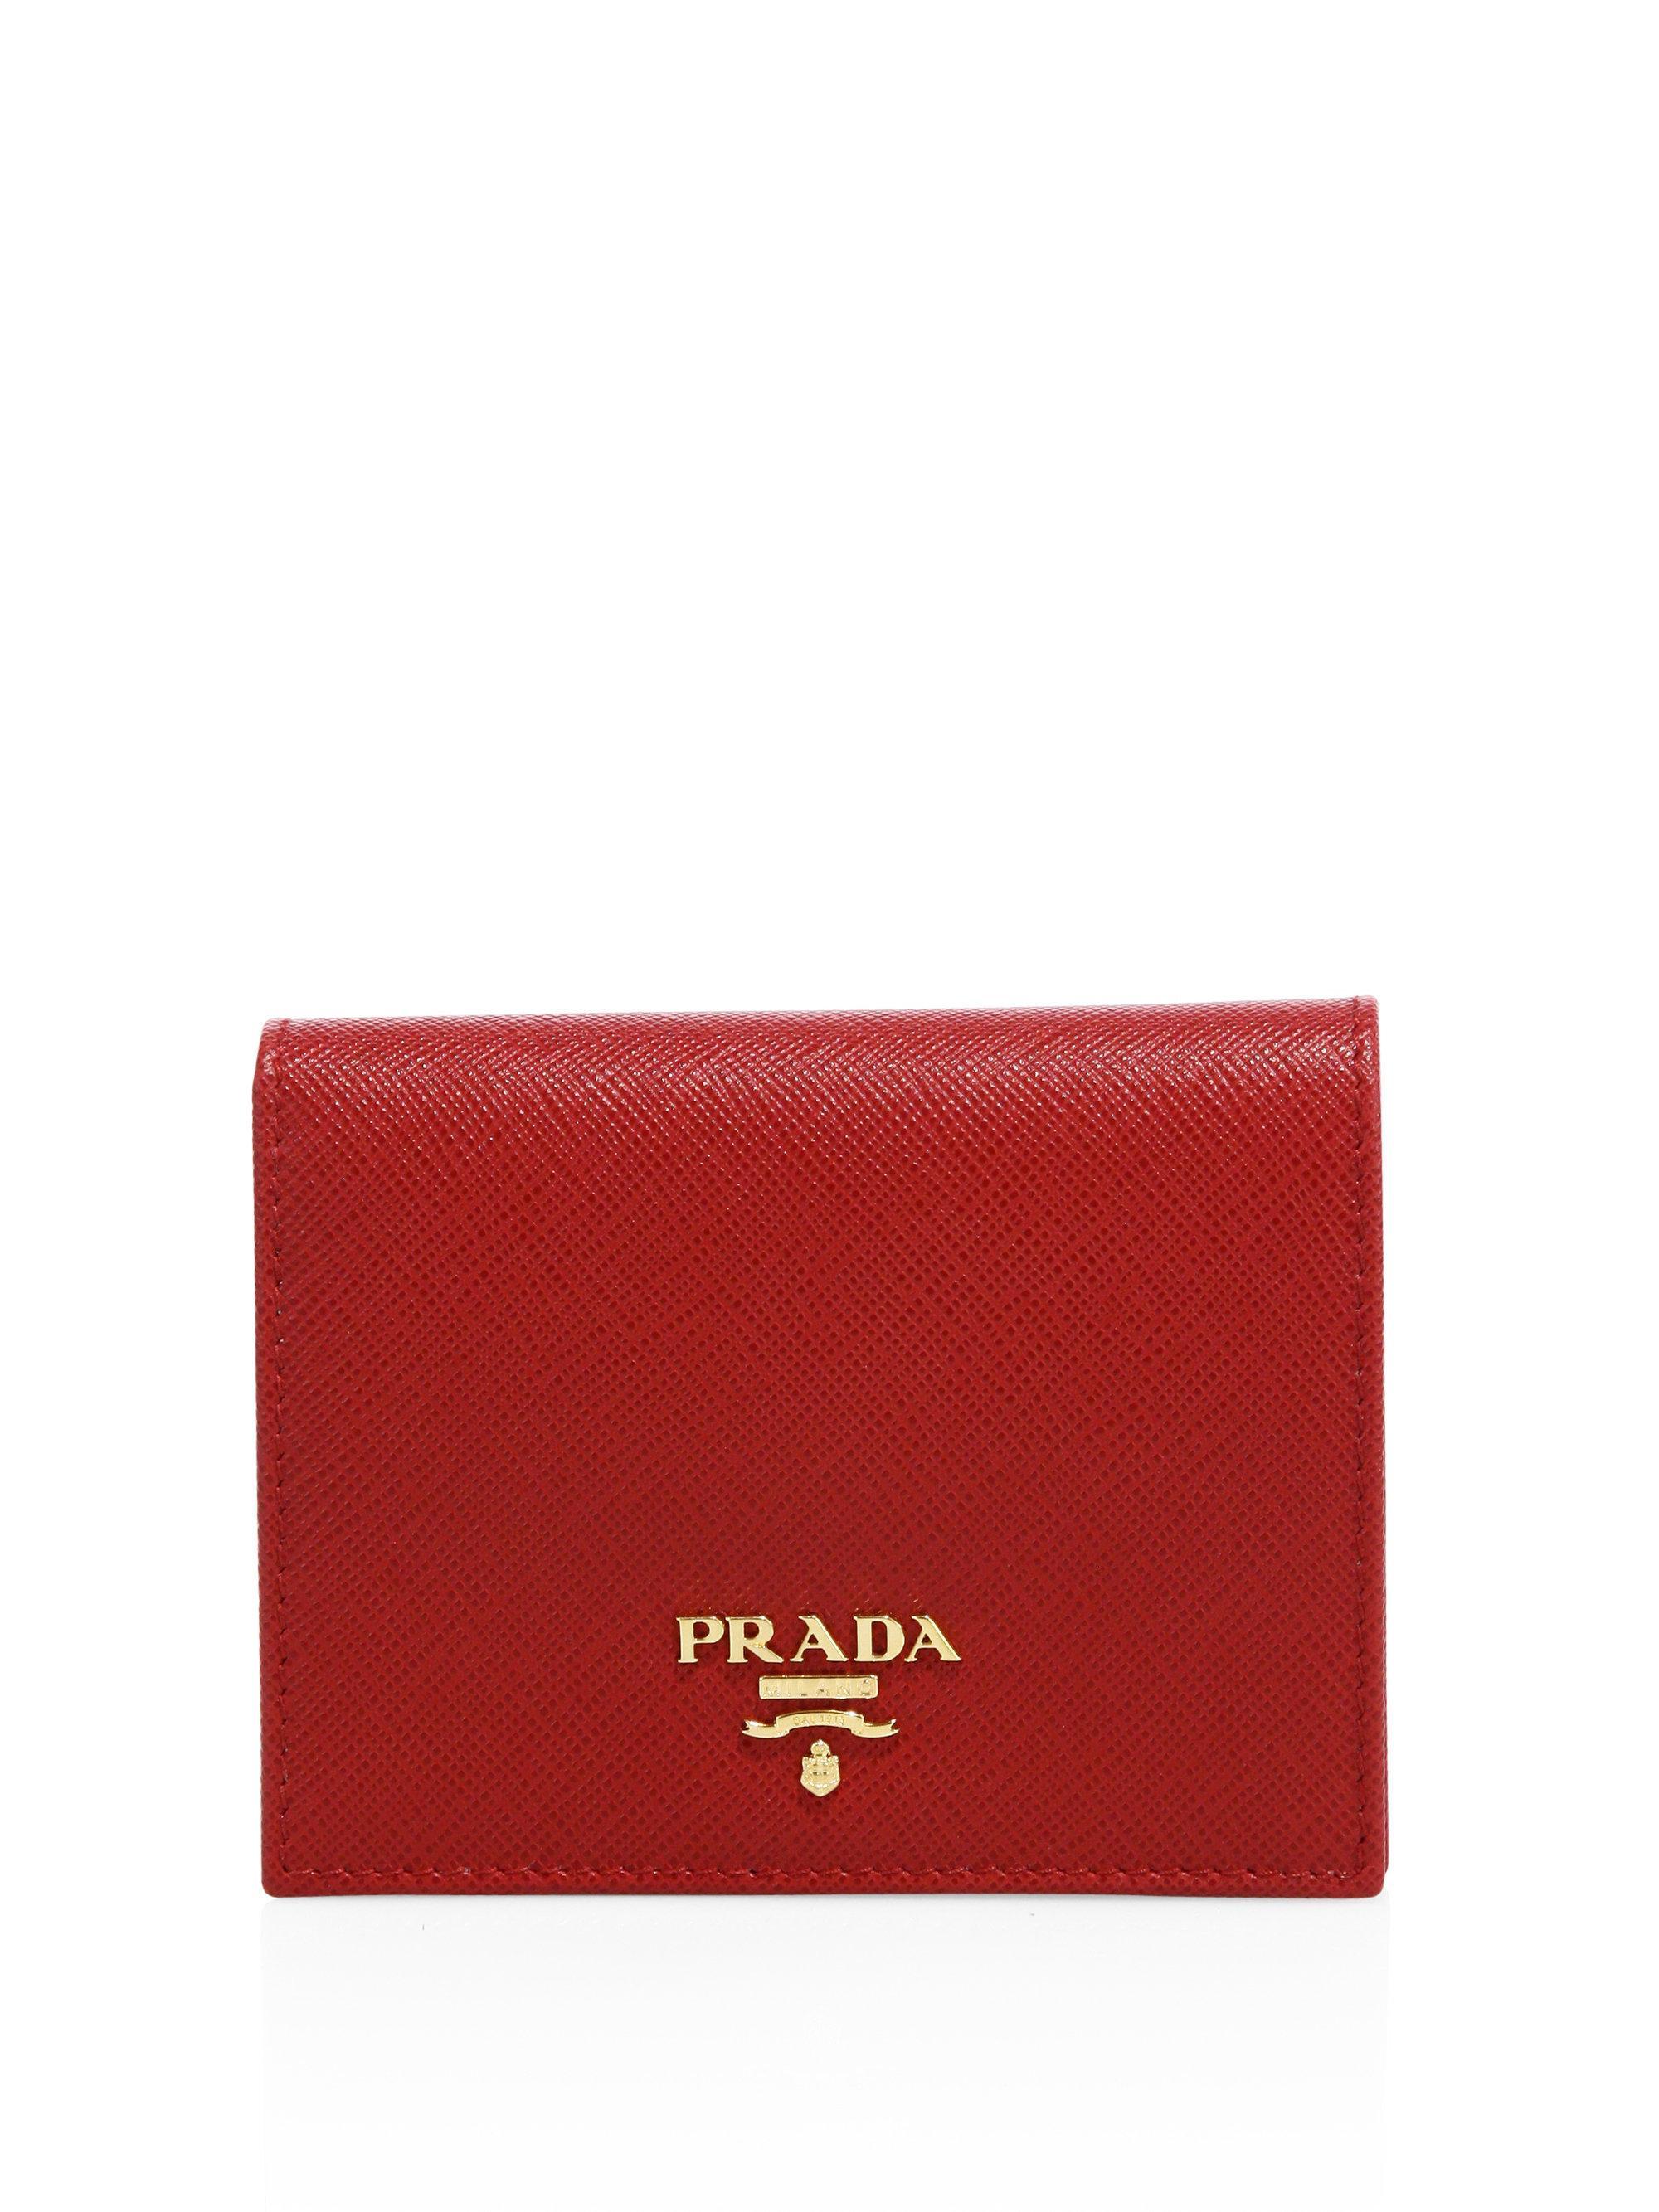 c65867b7e96d Prada Mini Saffiano Leather Bifold Wallet in Red - Lyst